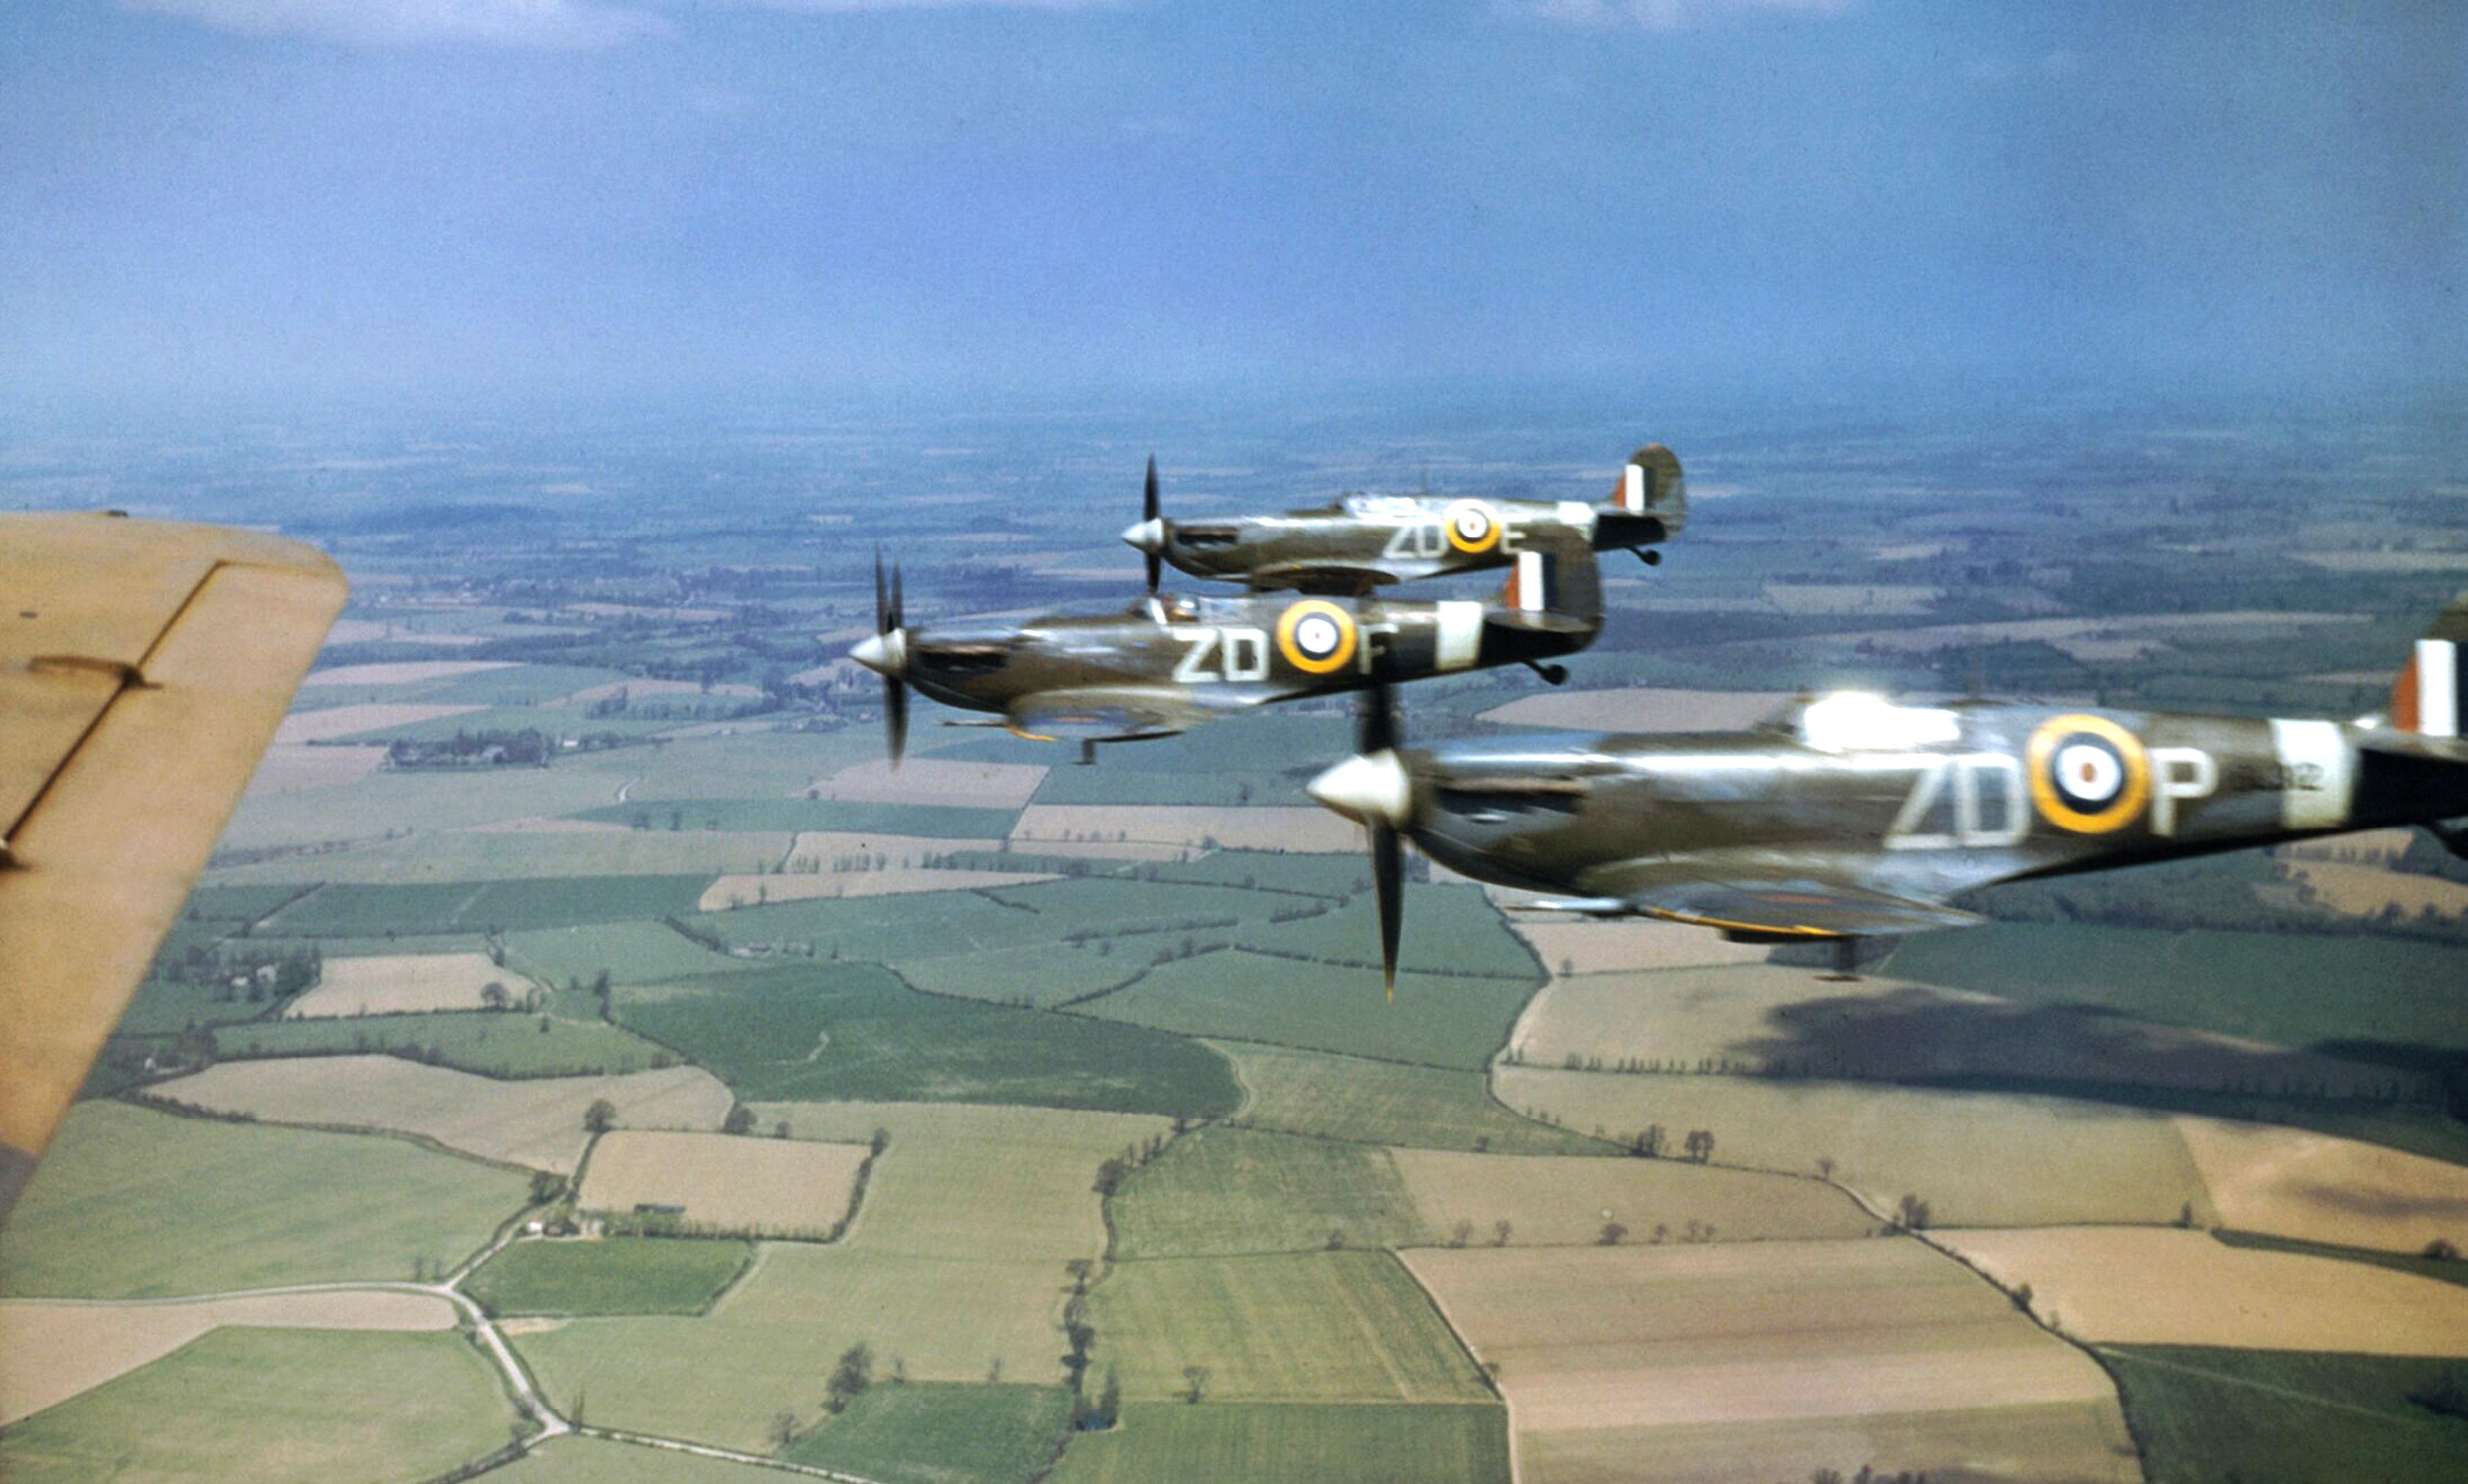 Spitfire MkVbs RAF 222Sqn ZDP ZDF and ZDE based at North Weald IWM COL190